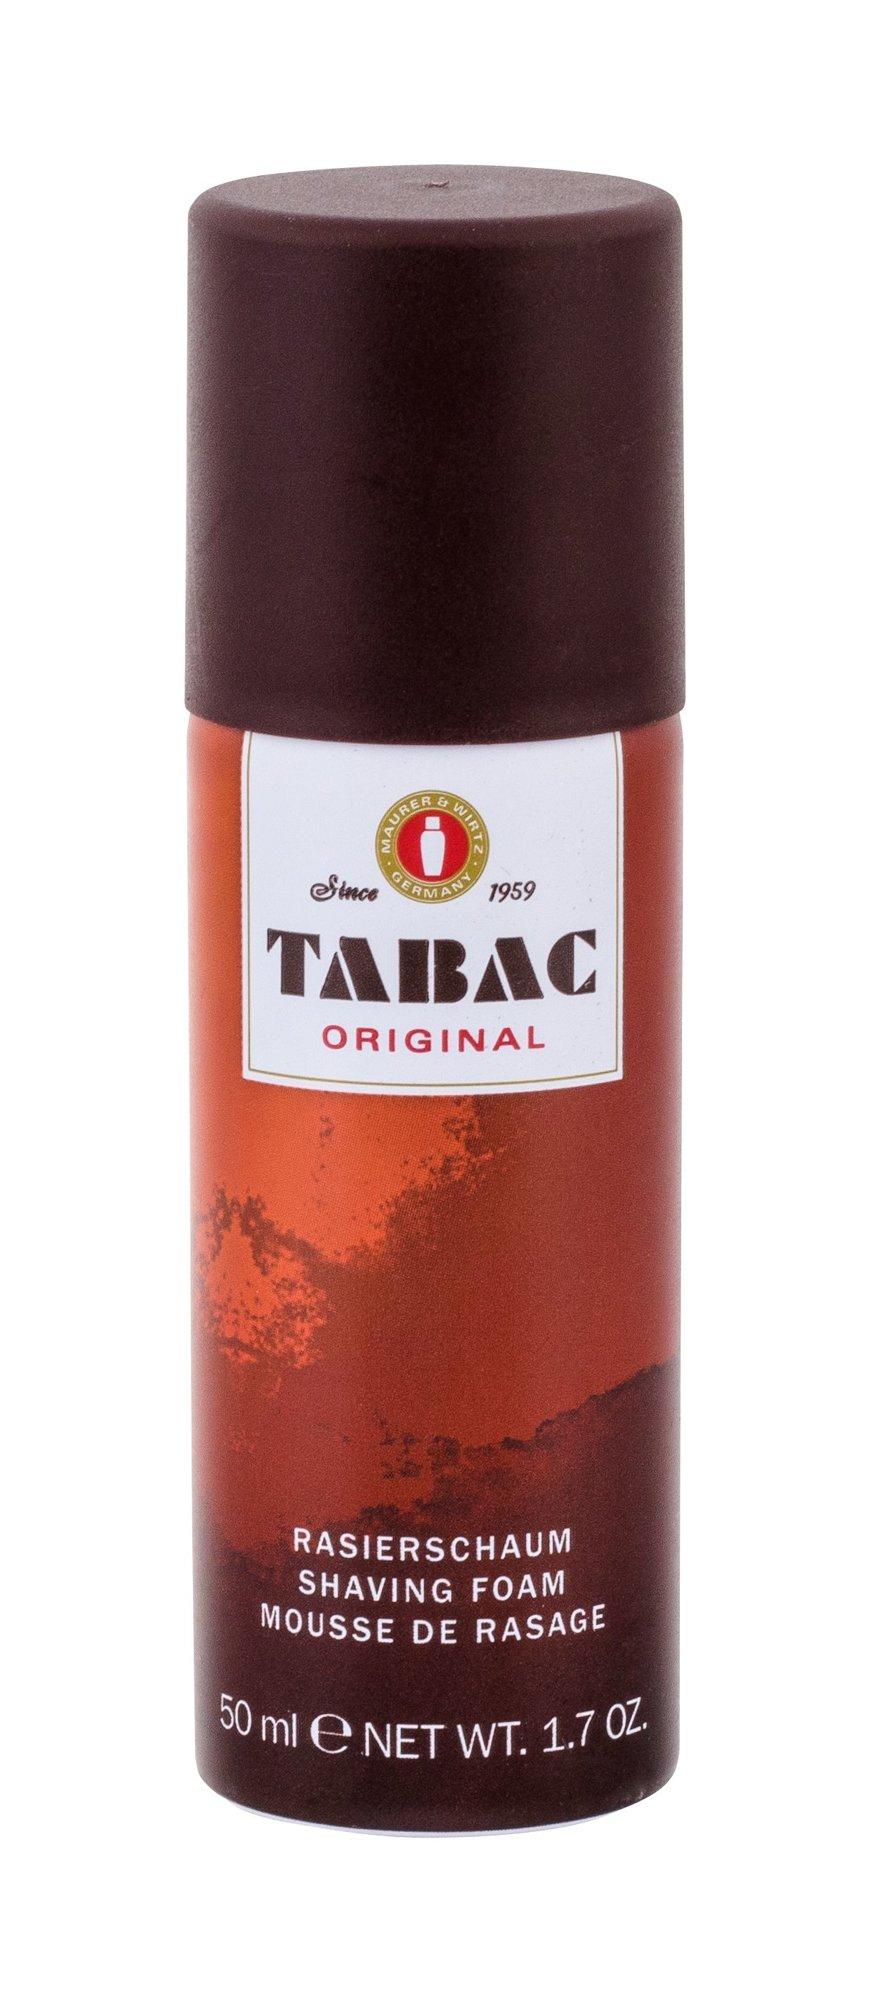 TABAC Original Shaving Foam 50ml